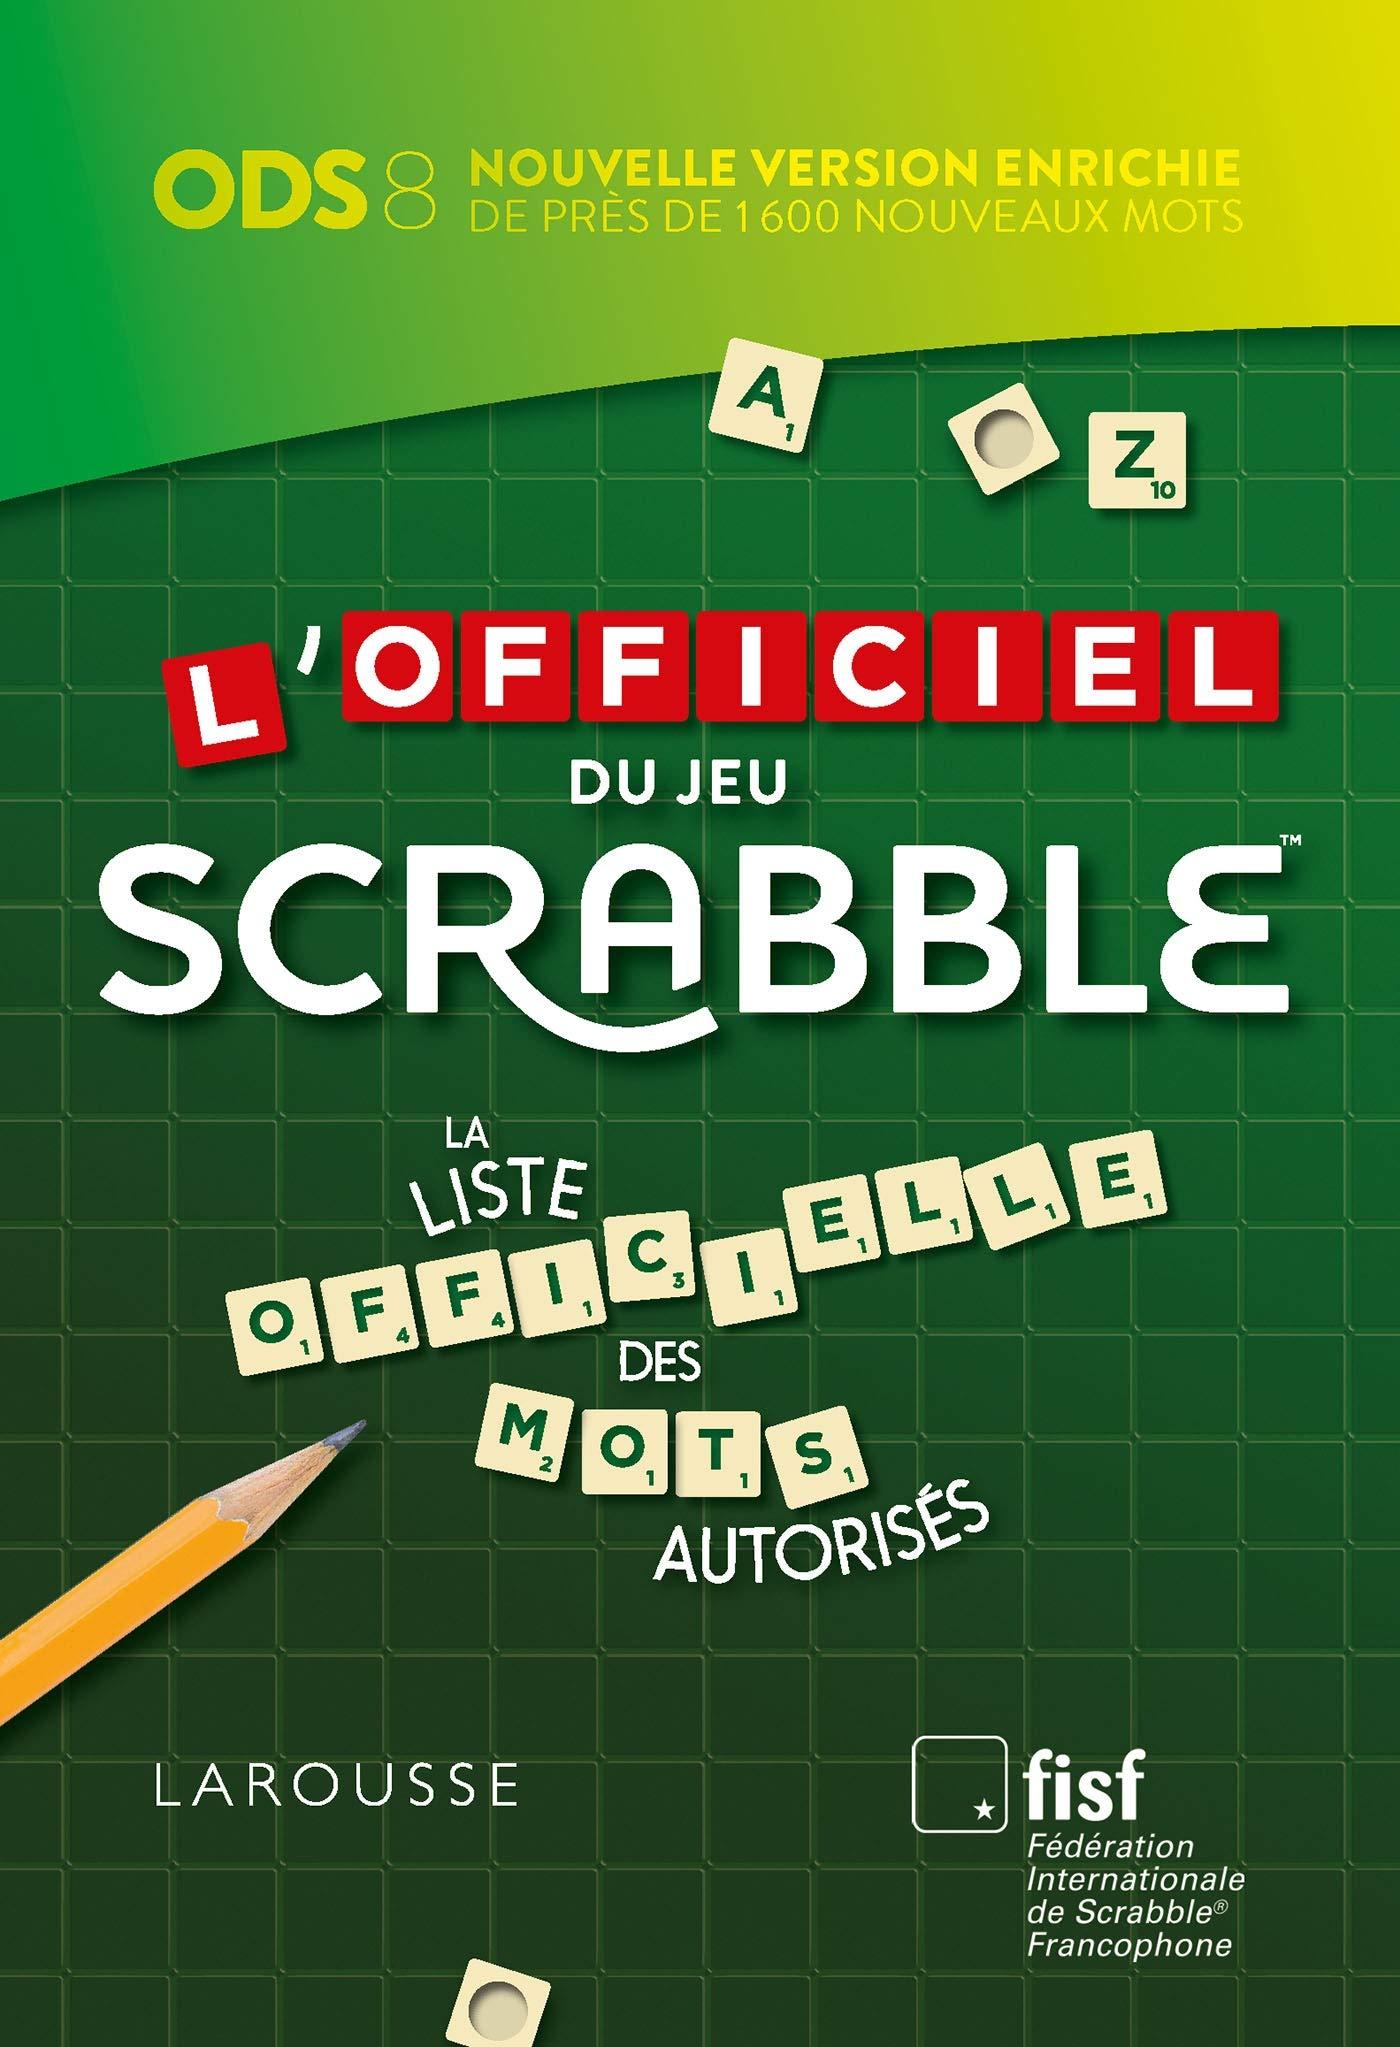 LOfficiel du jeu Scrabble®: Amazon.es: Fédération Internationale De Scrabble: Libros en idiomas extranjeros